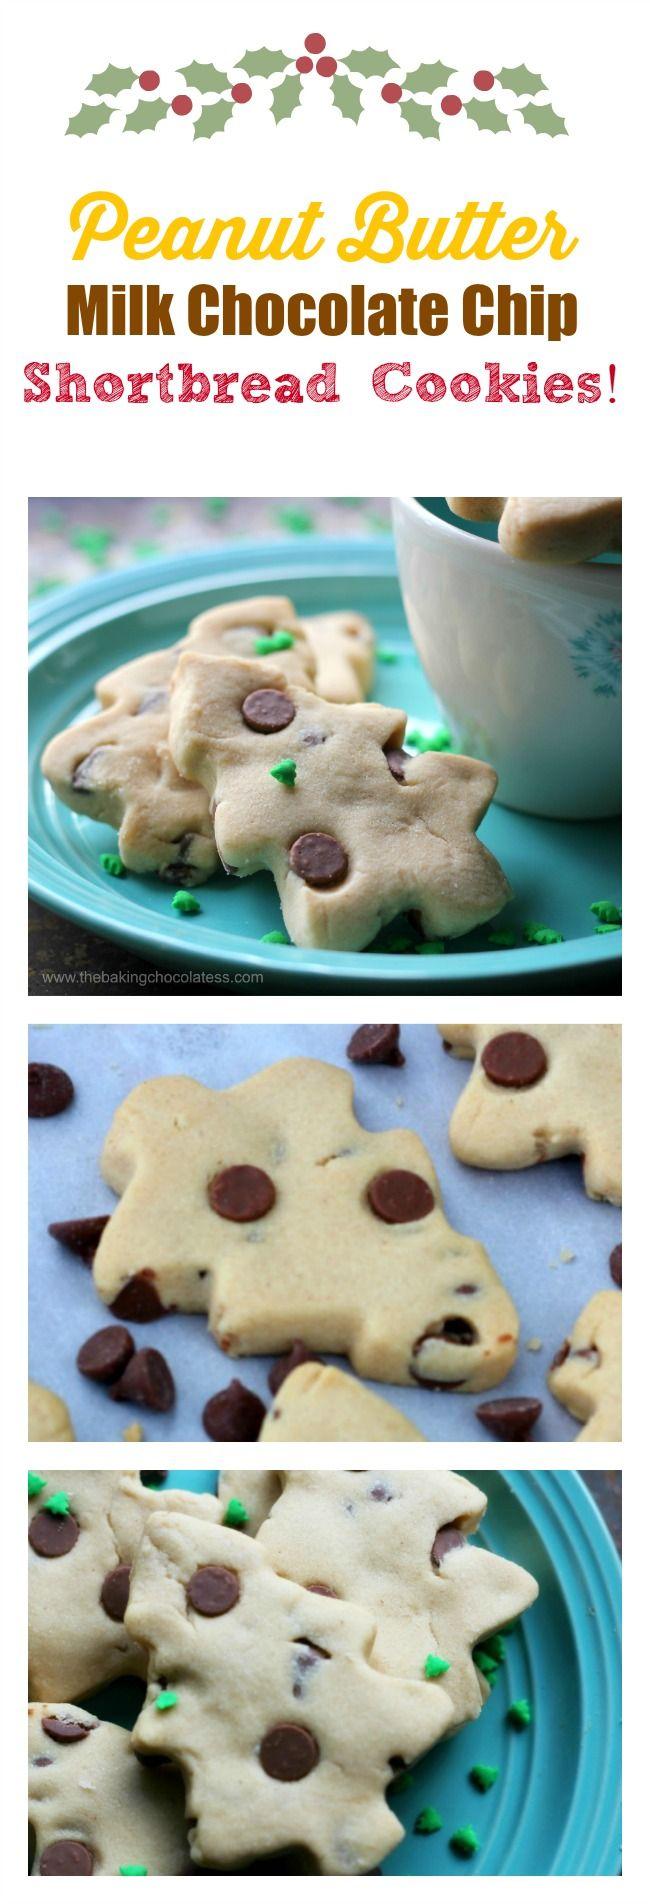 Peanut Butter Milk Chocolate Chip Shortbread Cookies! via @https://www.pinterest.com/BaknChocolaTess/